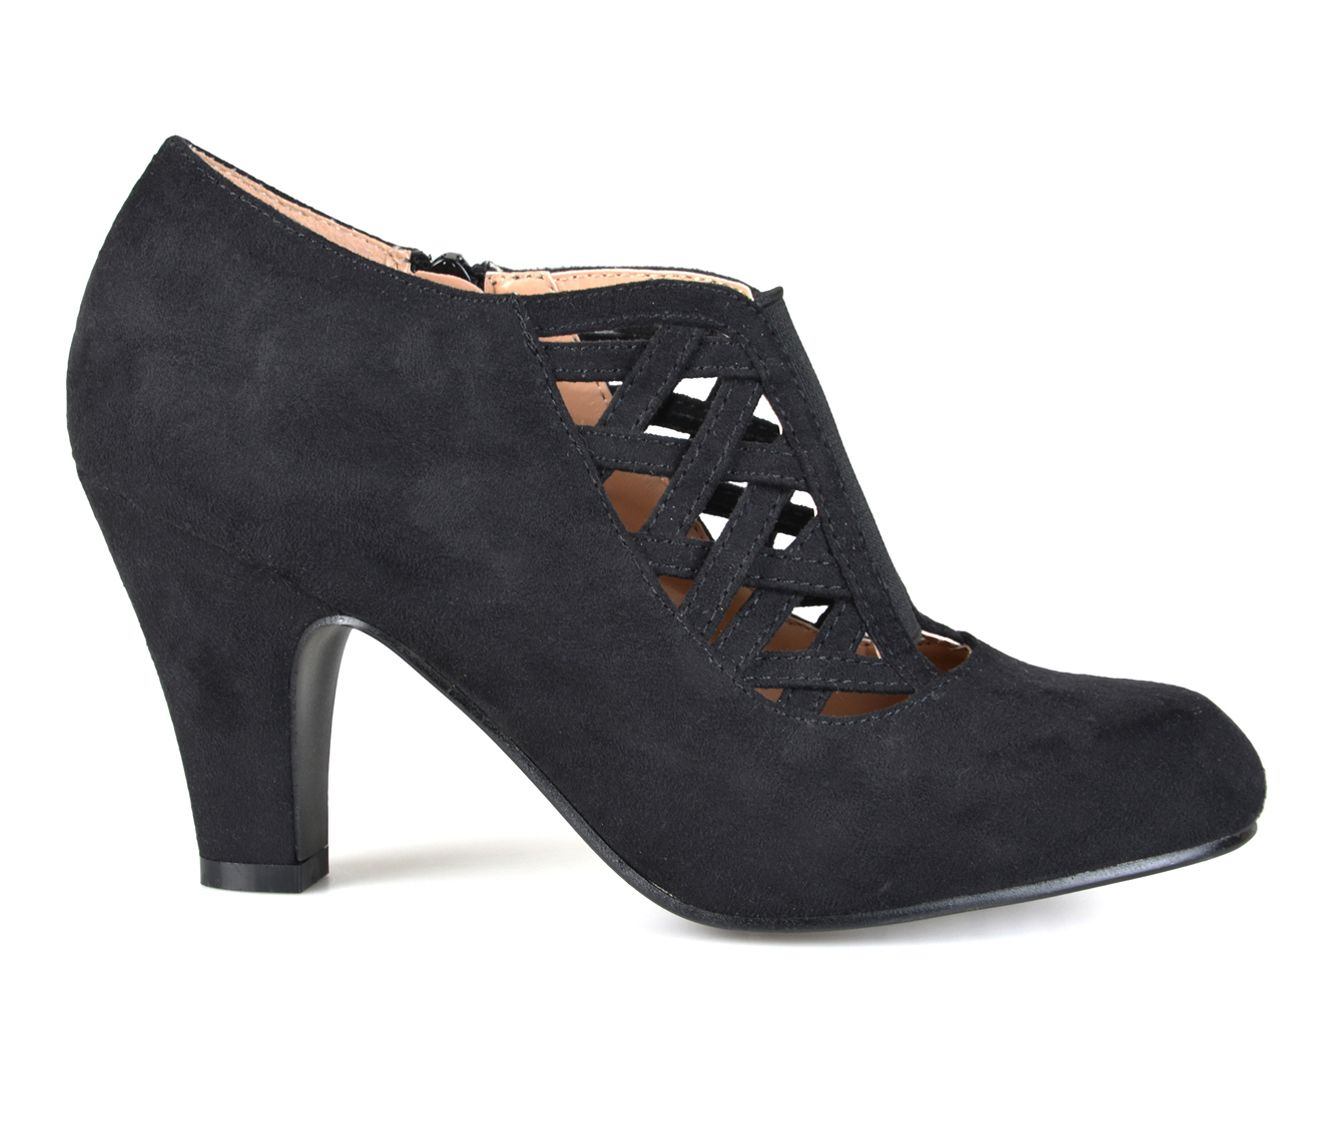 Journee Collection Piper Women's Dress Shoe